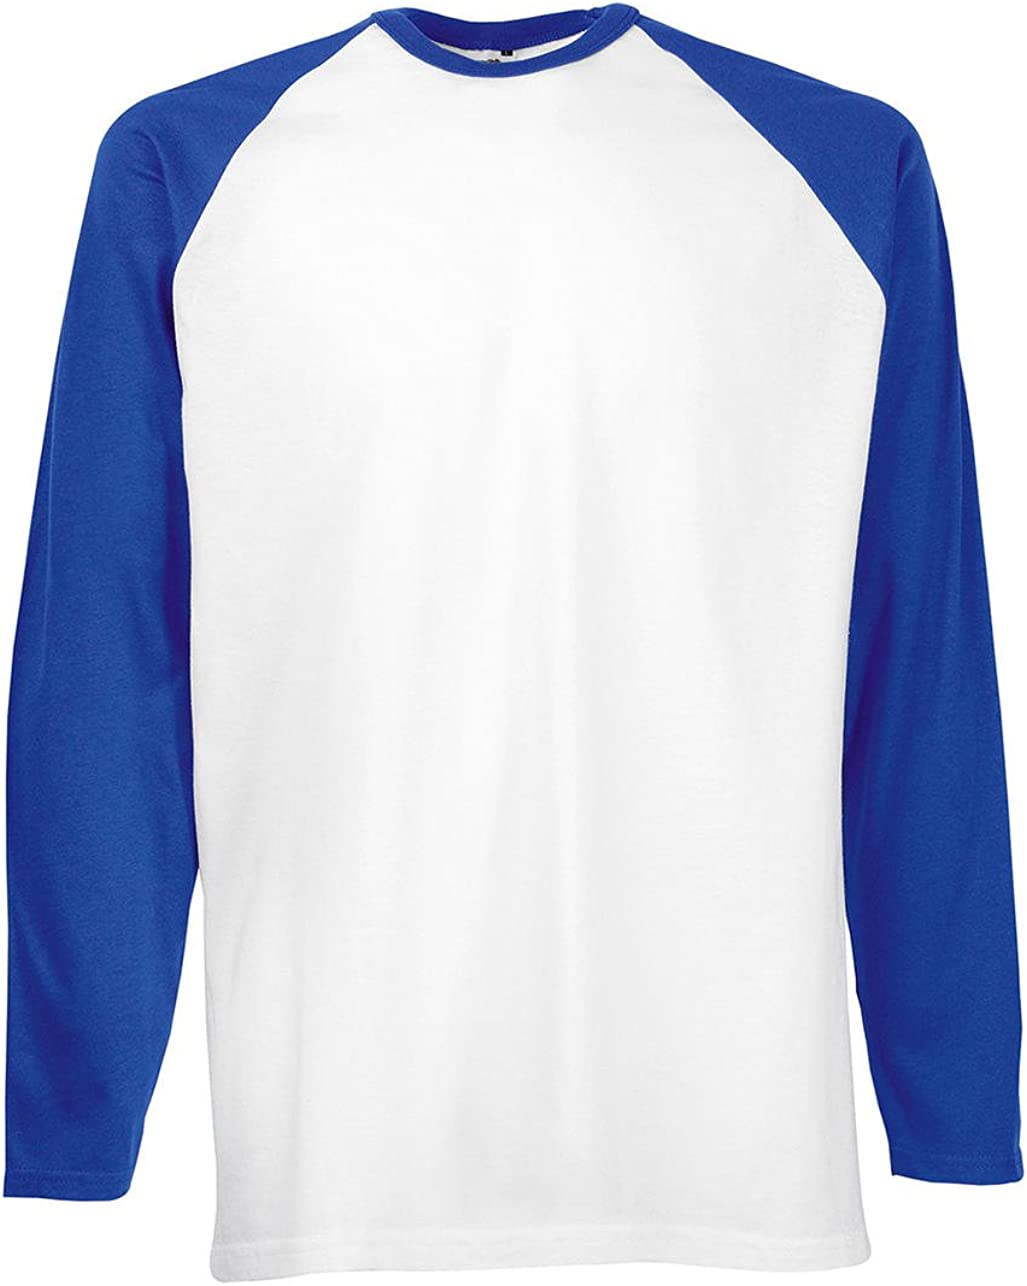 Fruit of the Loom Mens Baseball Classic Long Sleeve T-Shirt